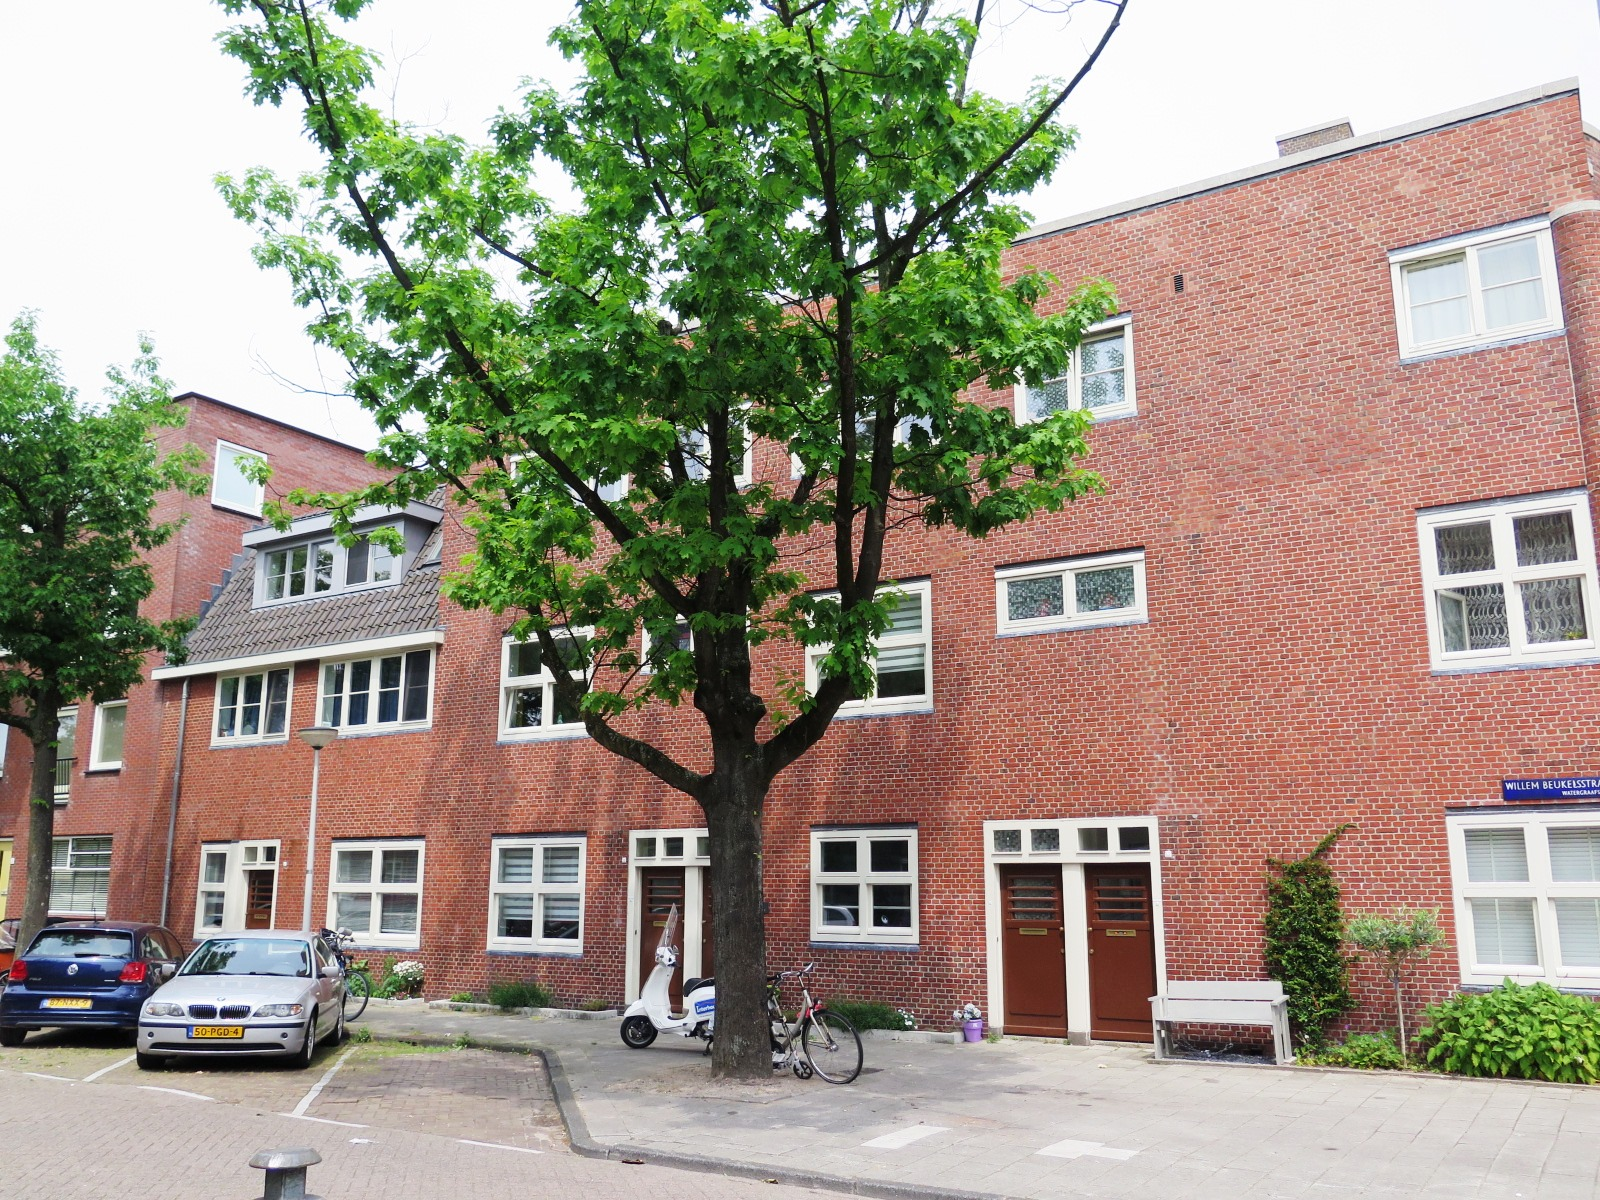 Willem Beukelsstraat, Amsterdam